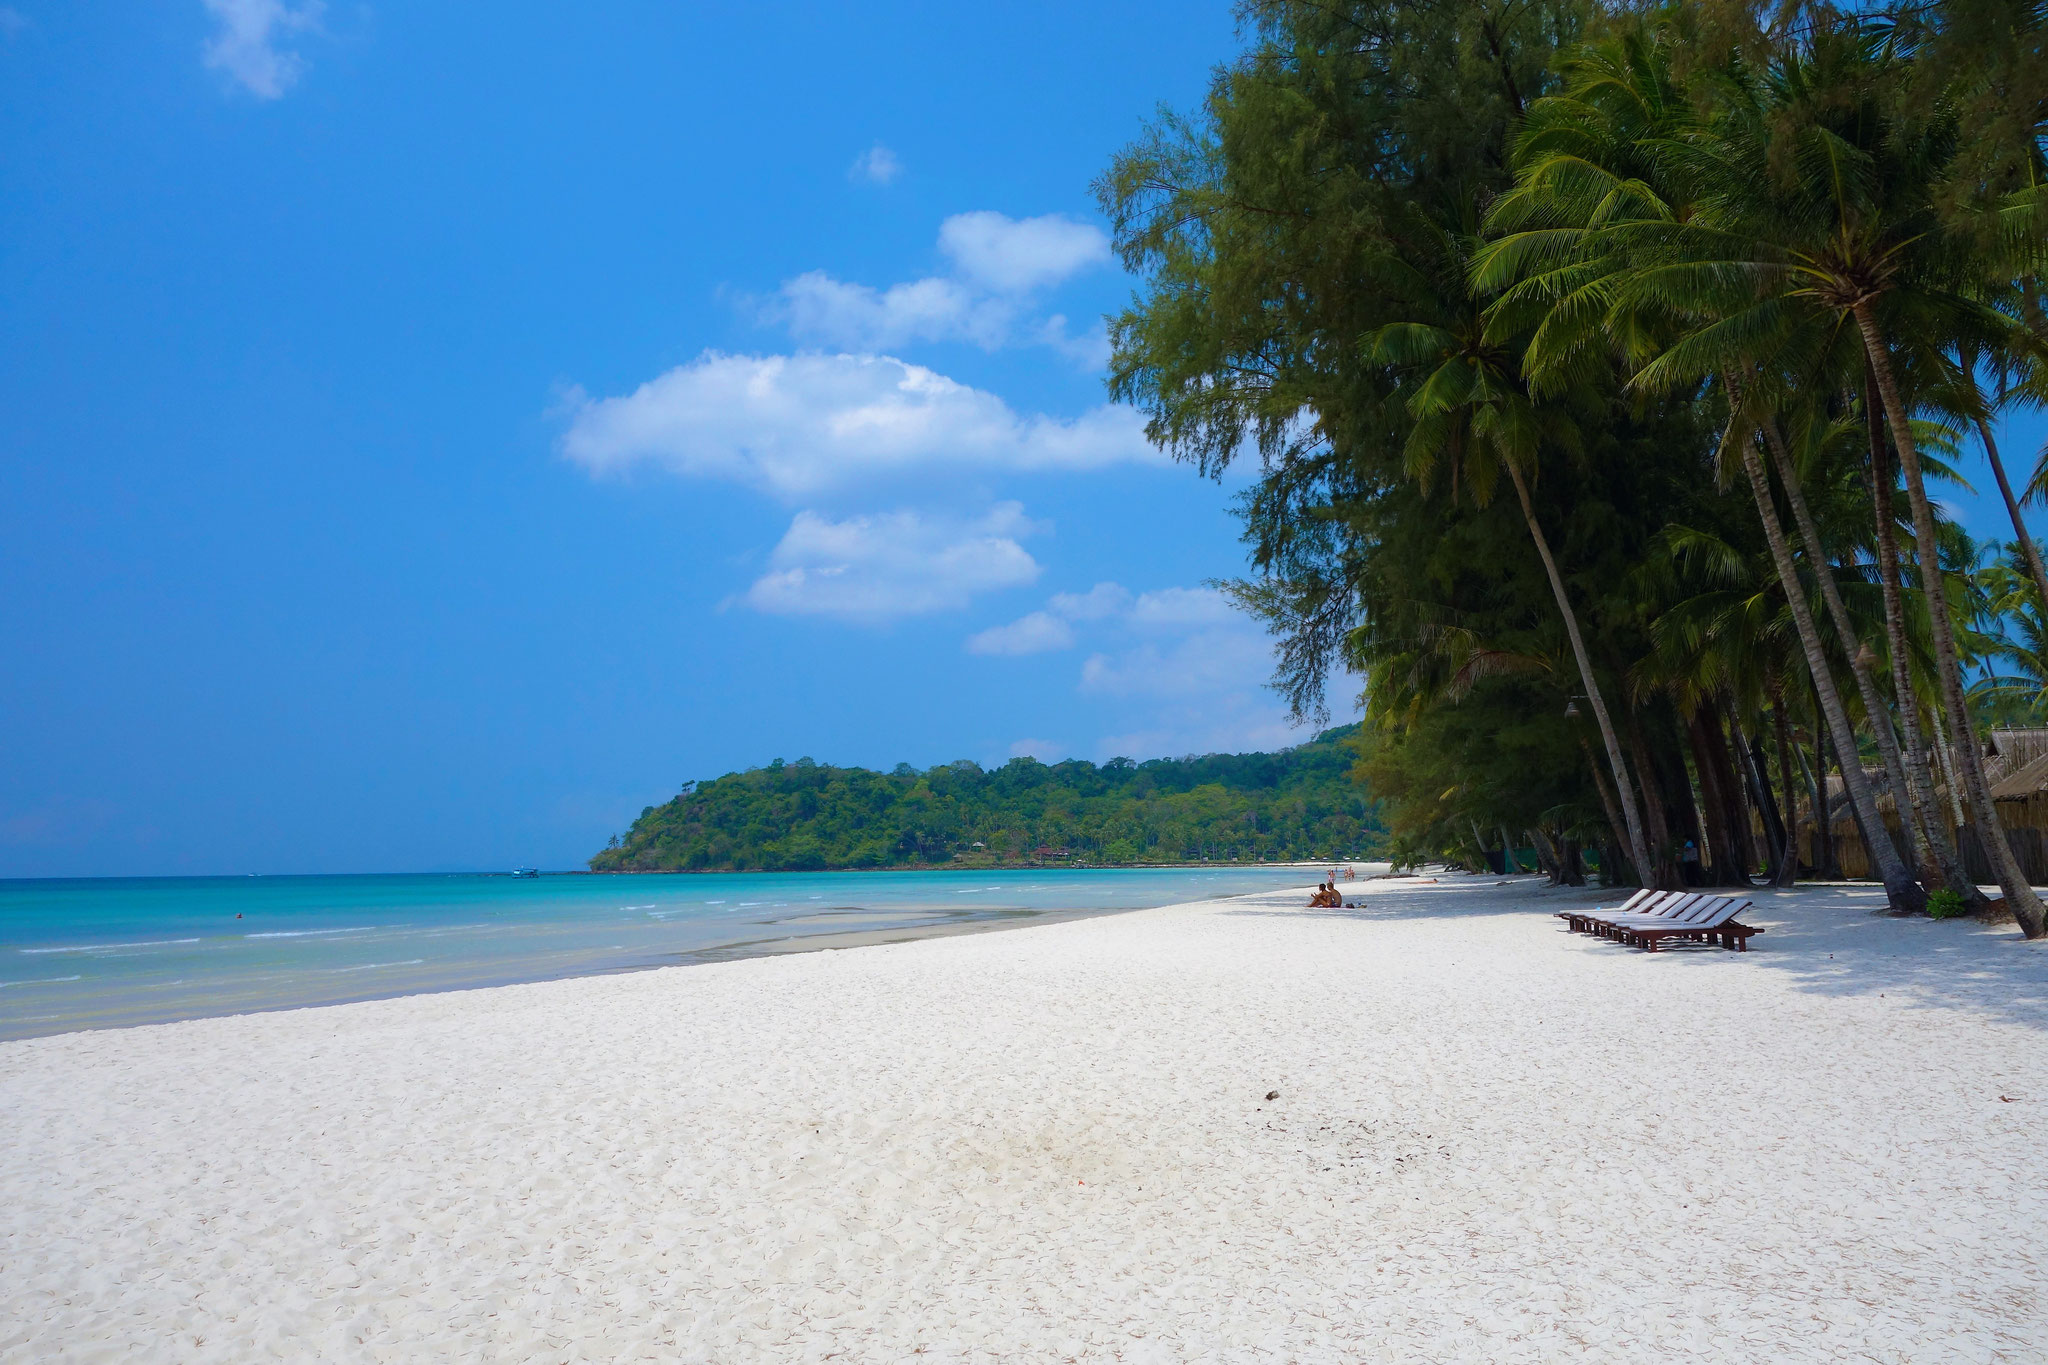 Beach Ko Kod